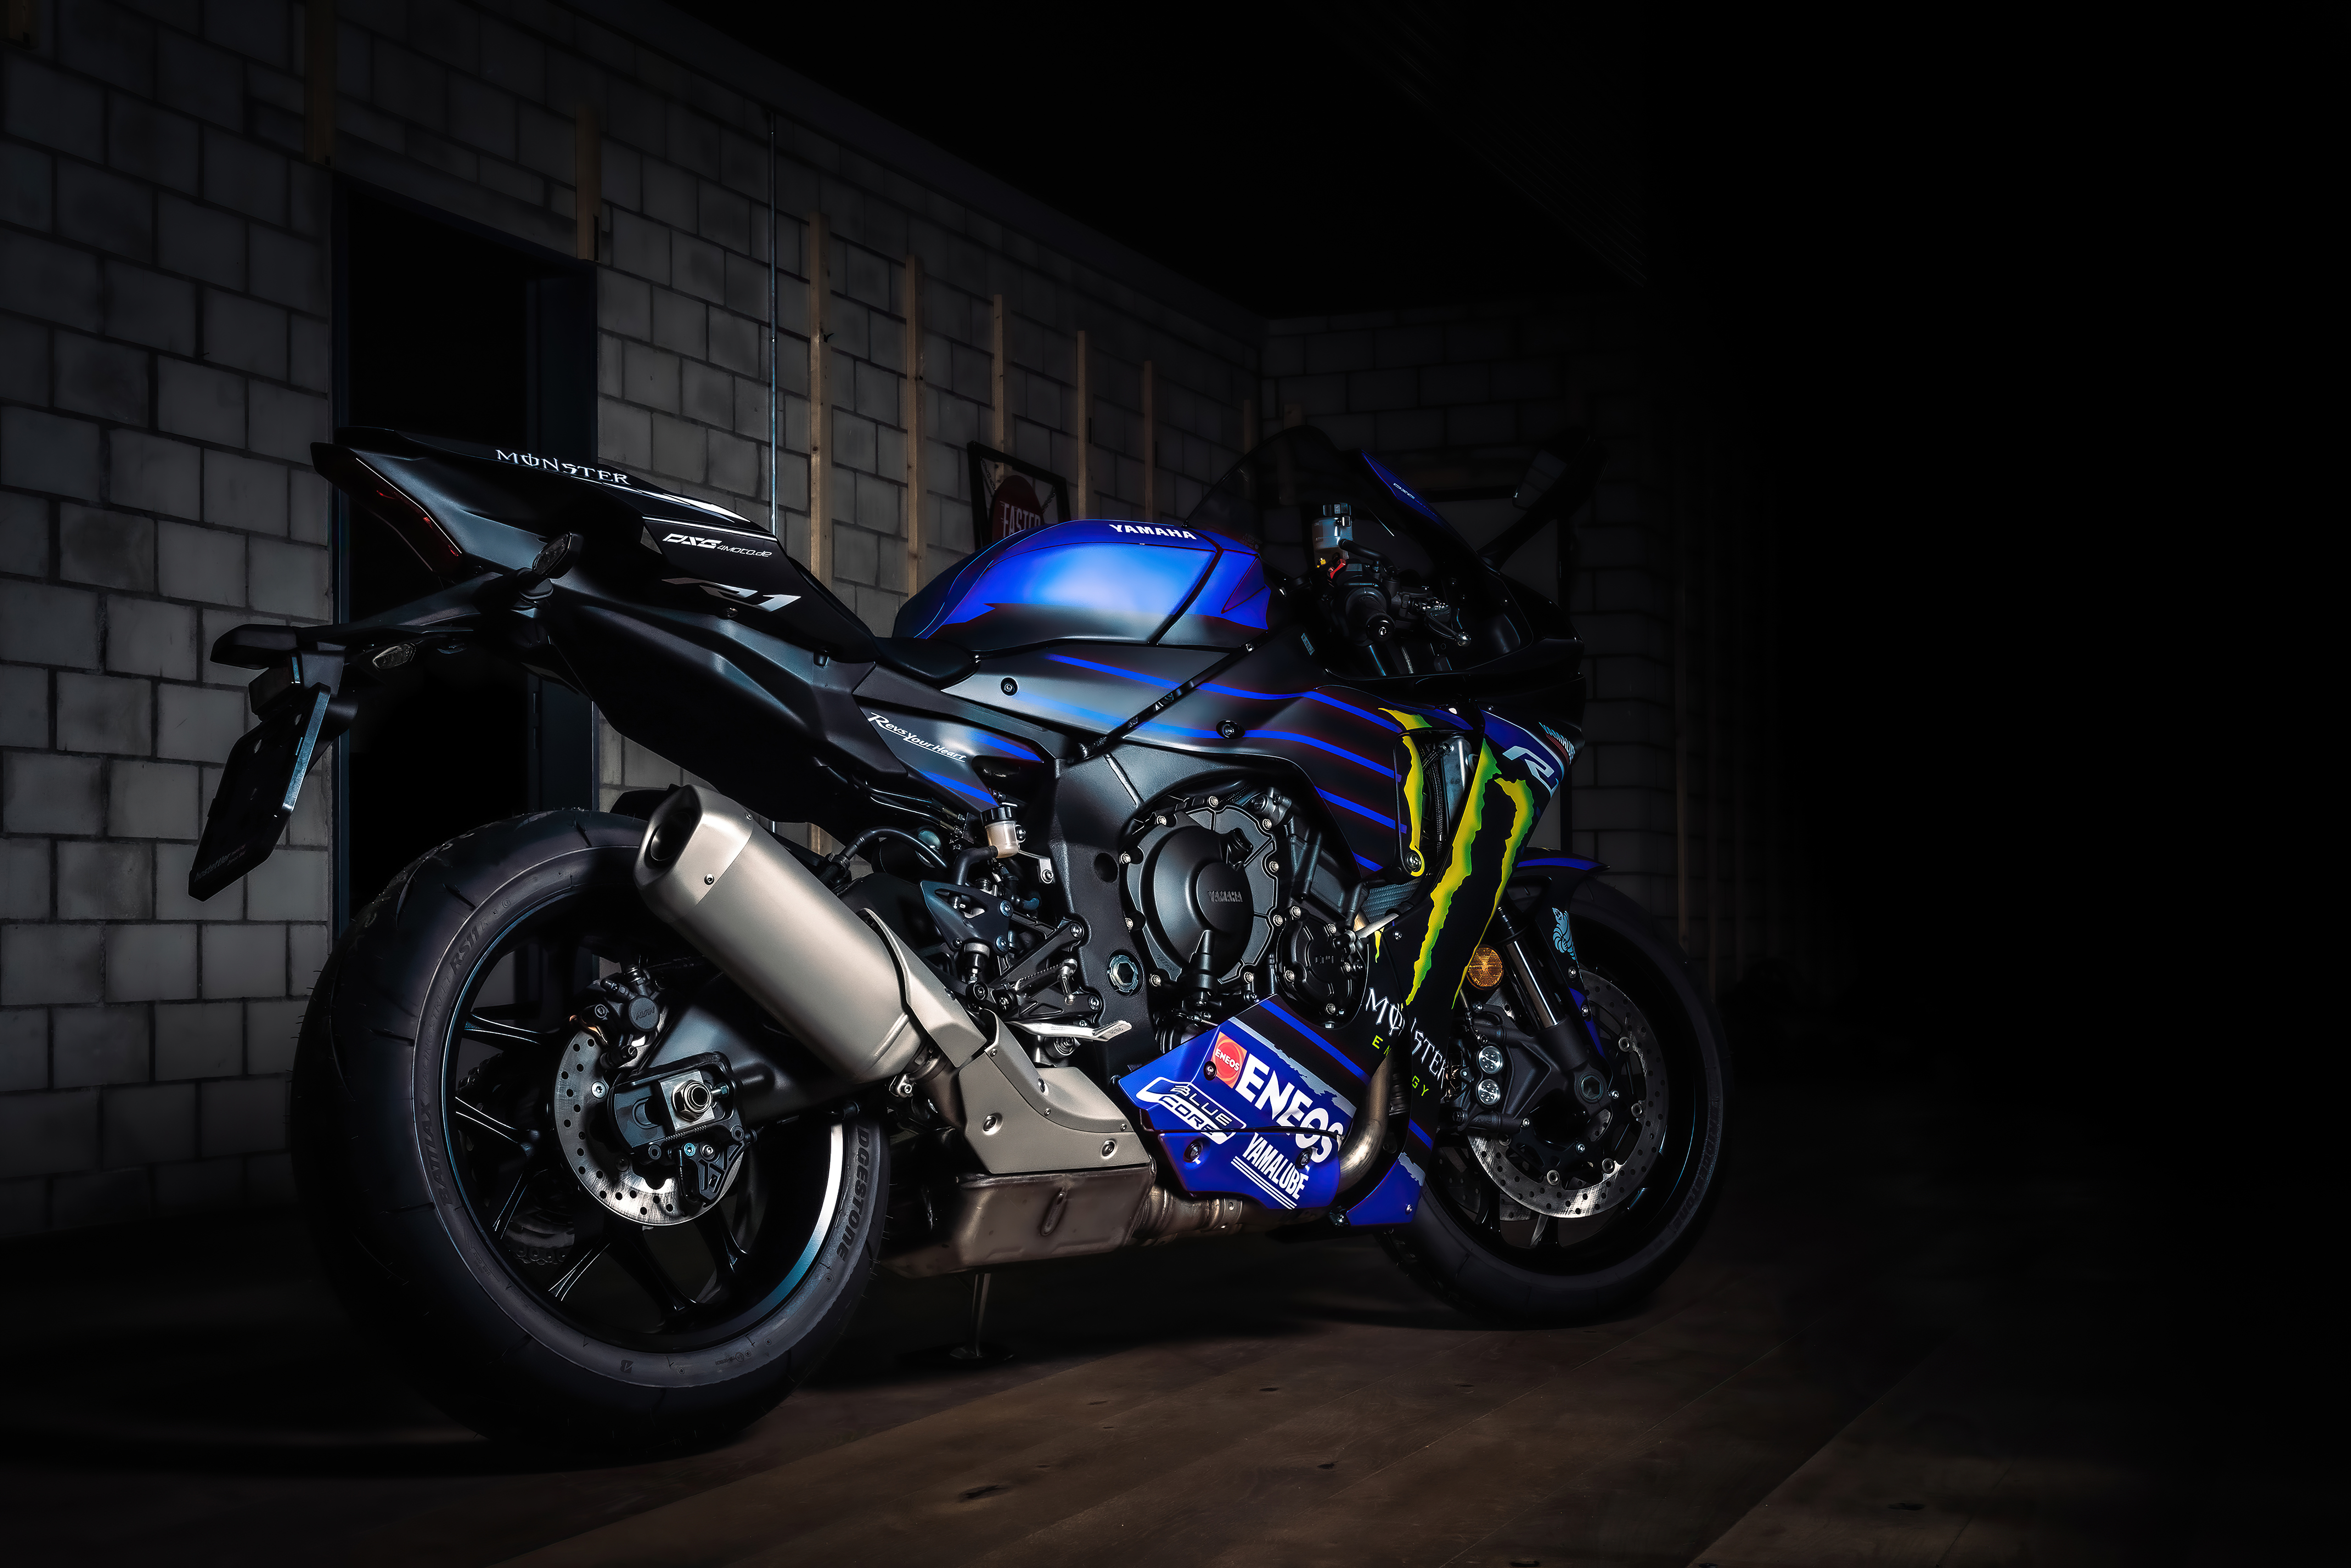 yamaha r1 valentino rossi 4k 1616876693 - Yamaha R1 Valentino Rossi 4k - Yamaha R1 Valentino Rossi 4k wallpapers